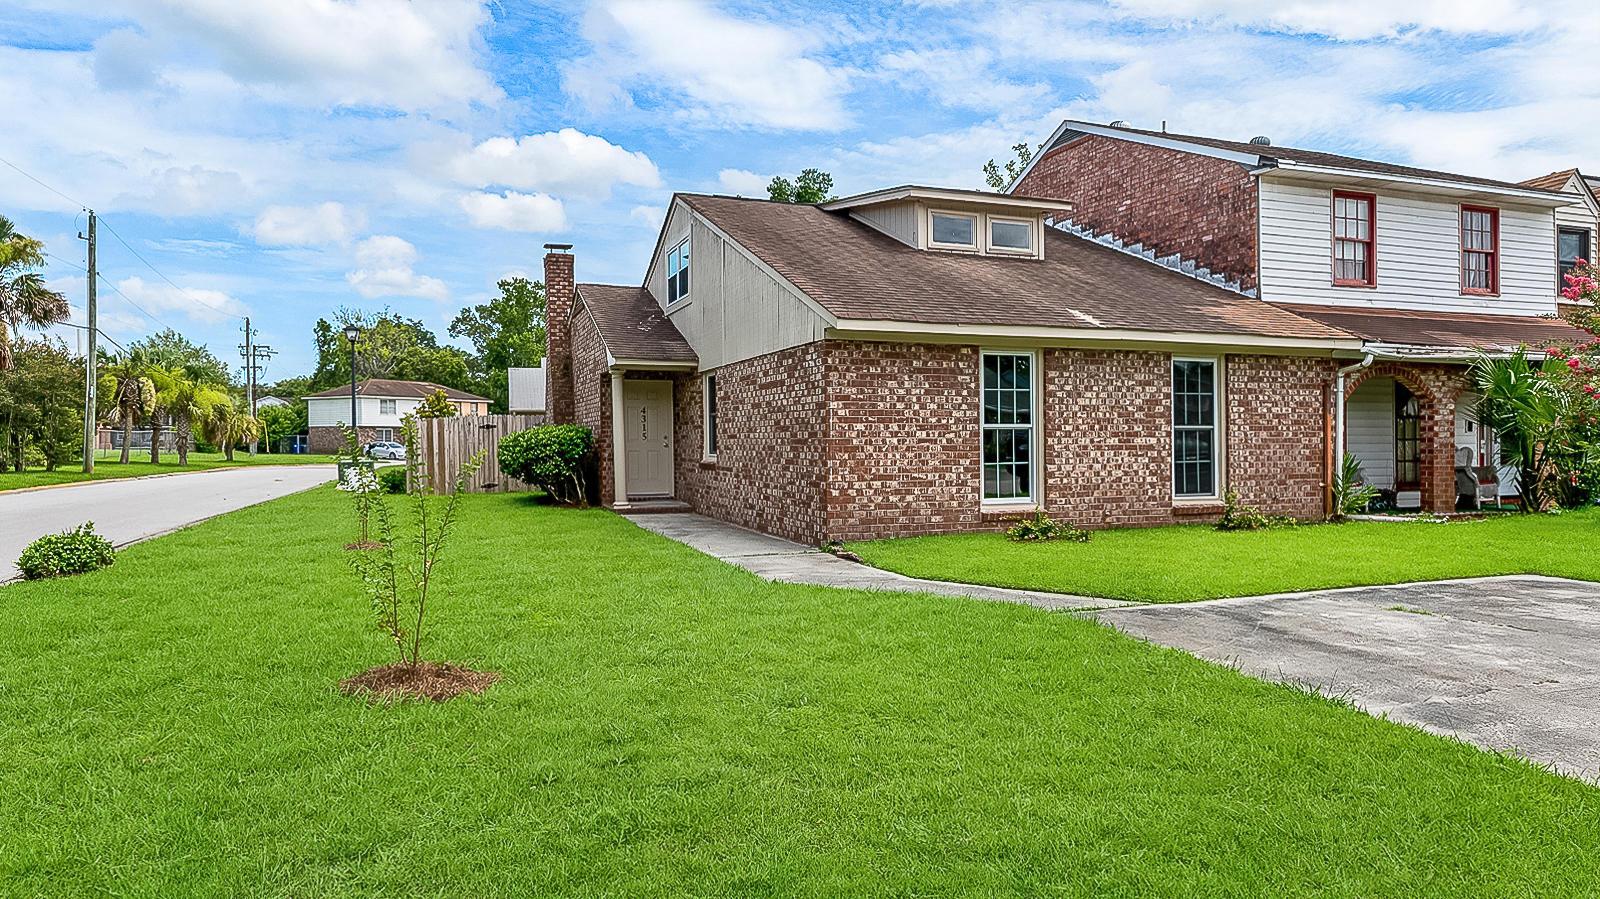 Ashley Villas Homes For Sale - 4315 Briarstone, North Charleston, SC - 27